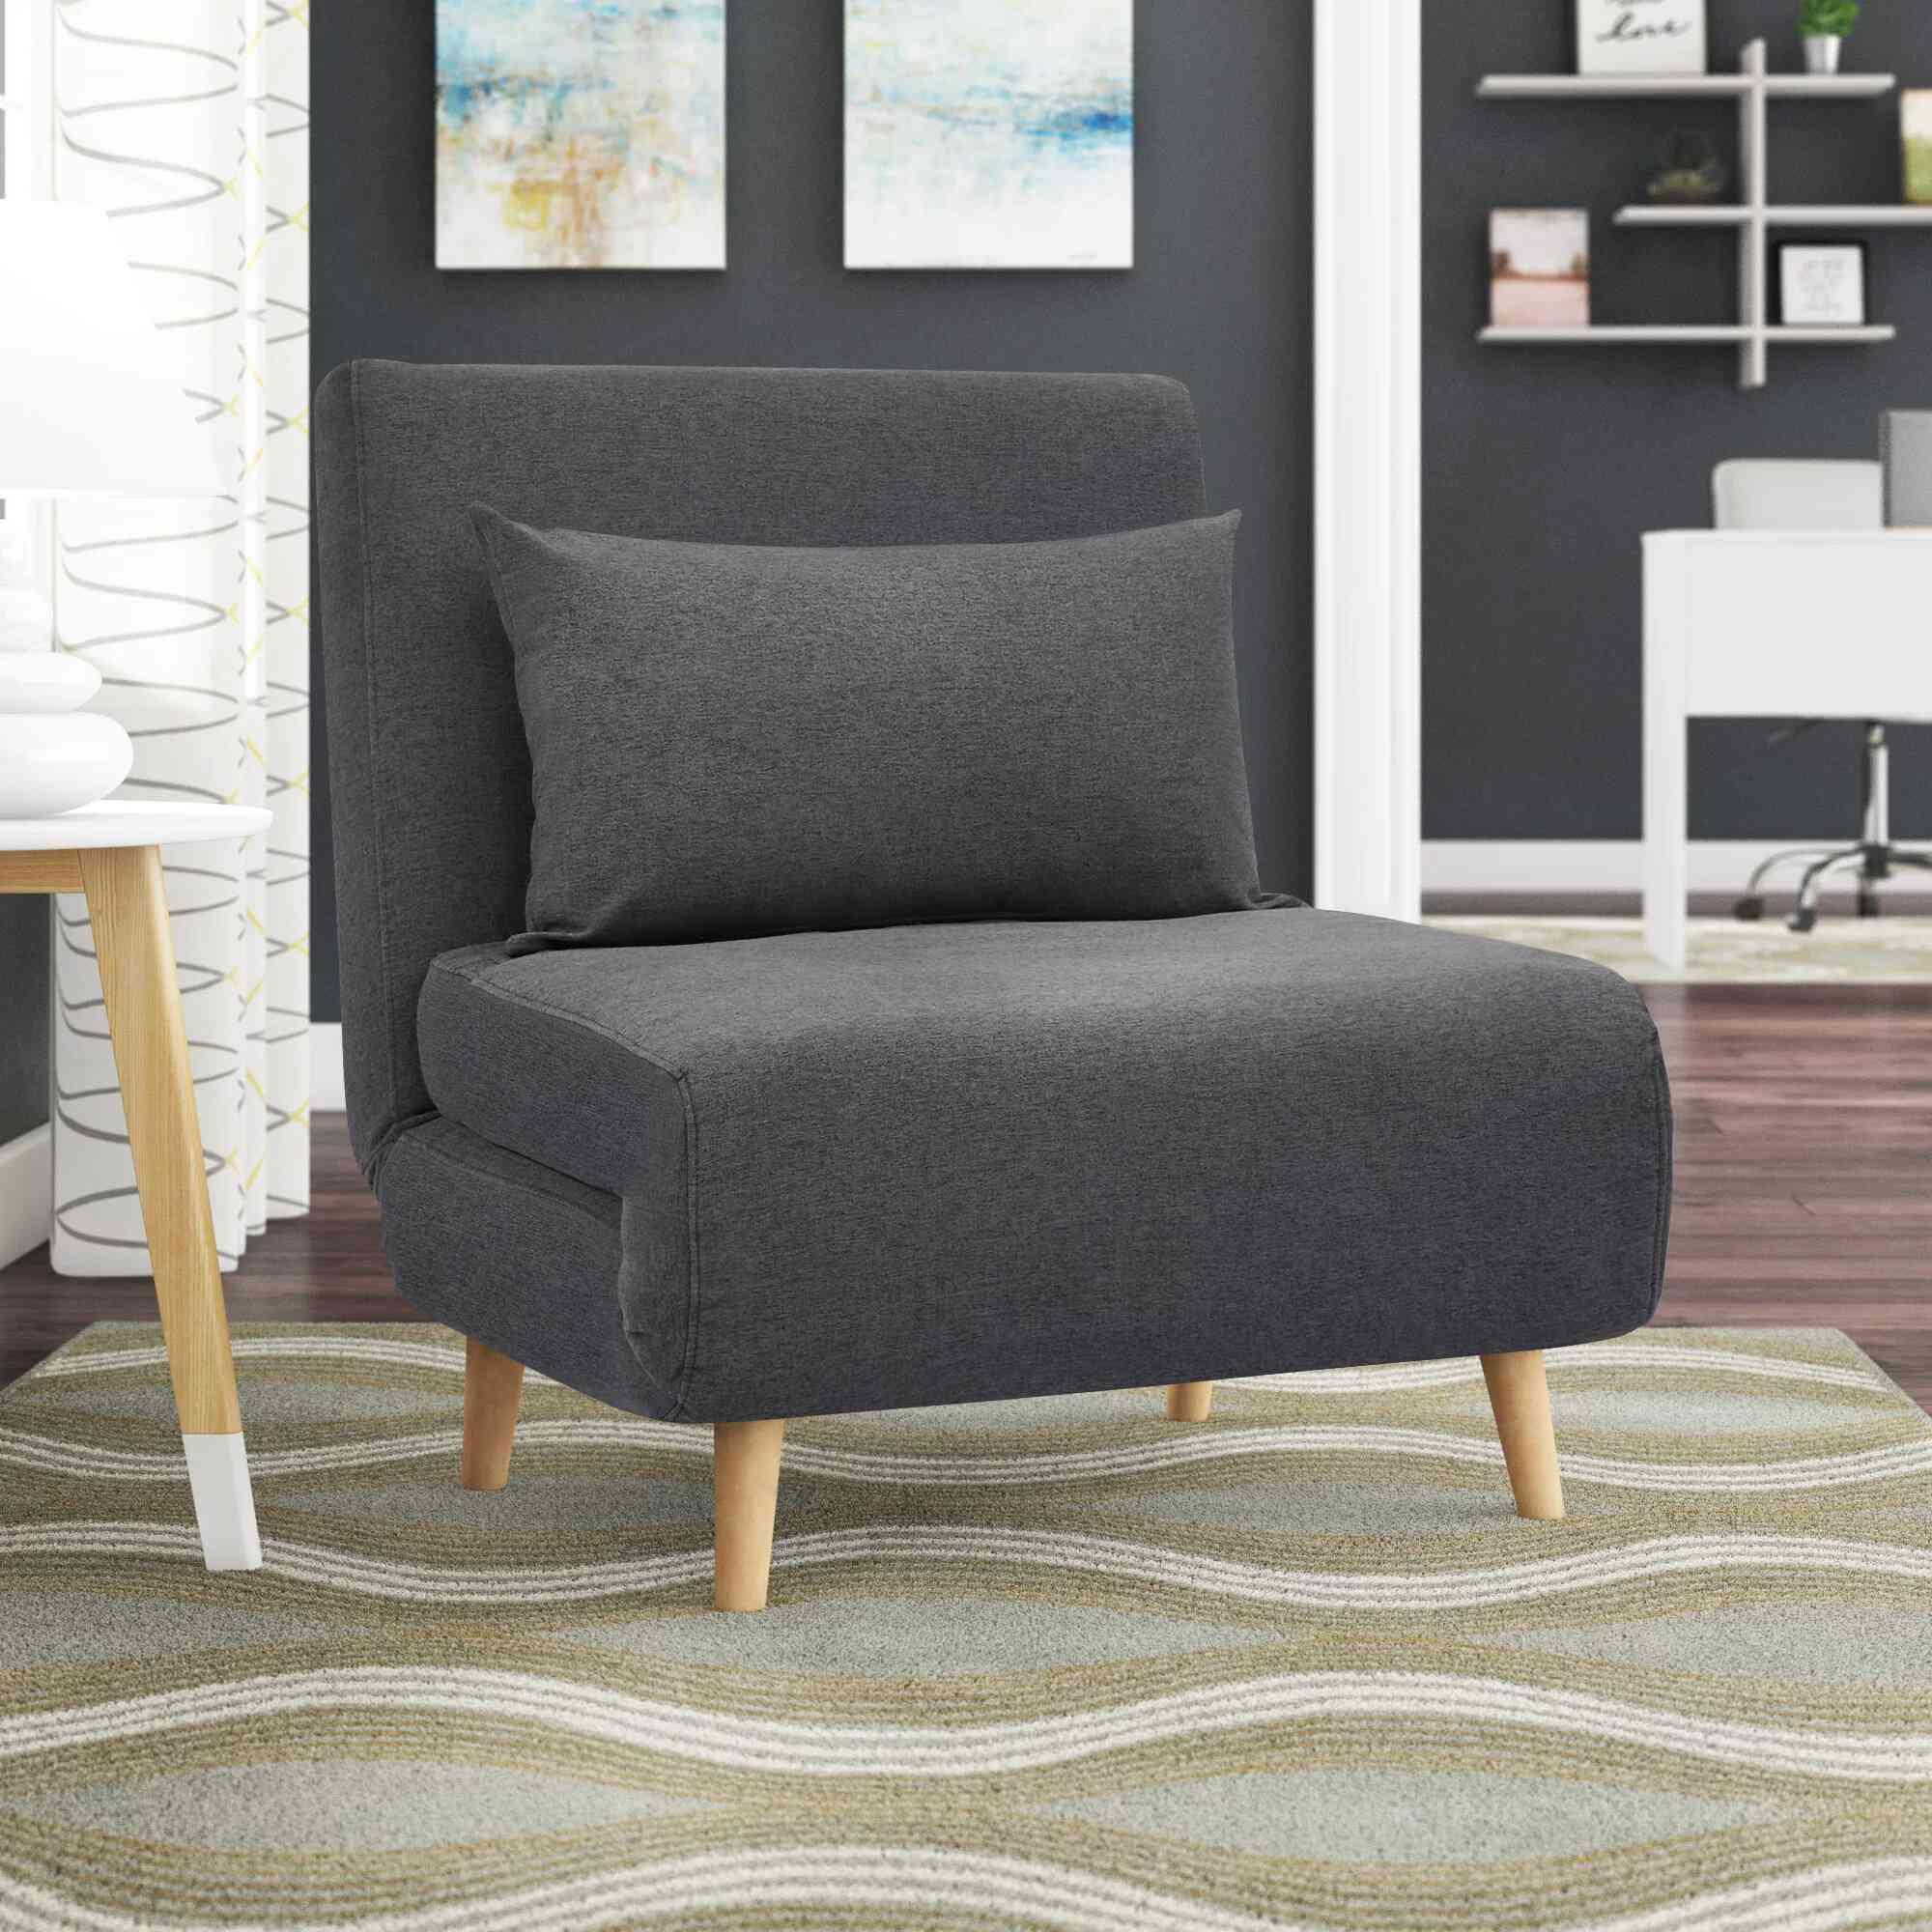 Corrigan Studio Bolen Convertible Chair